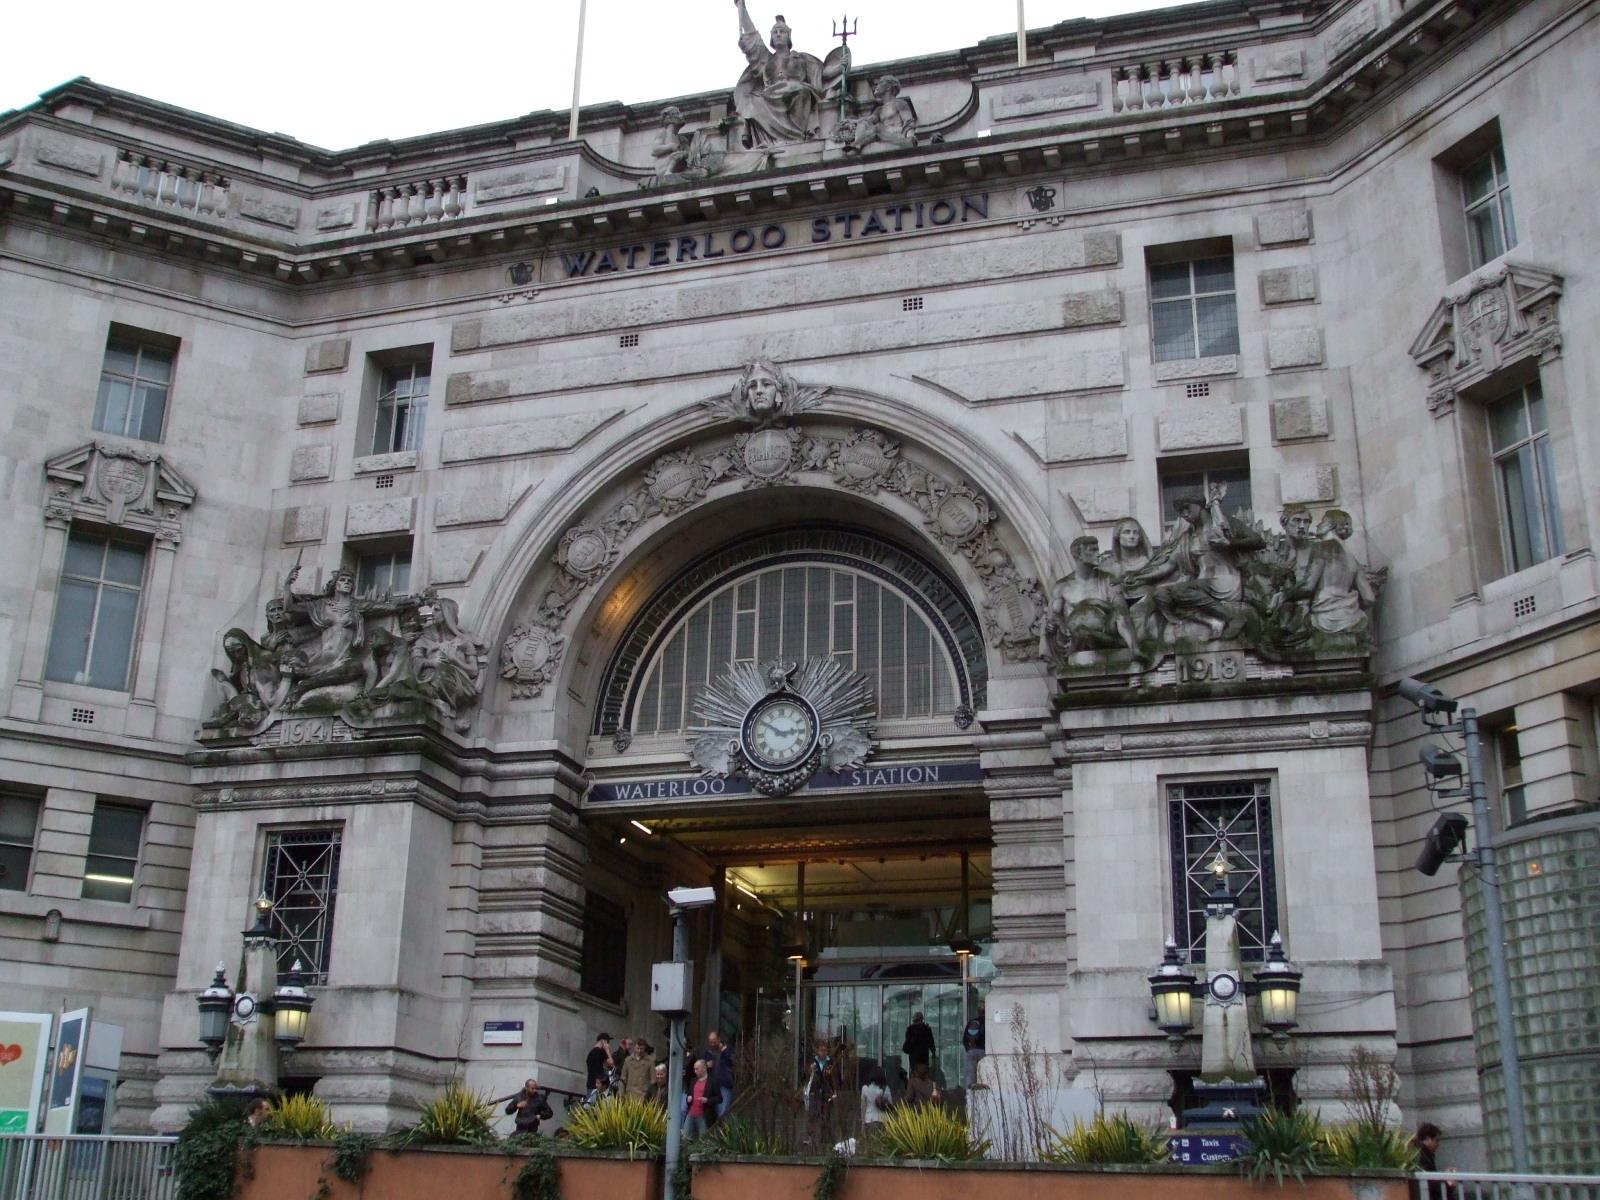 waterloo station entrance.JPG